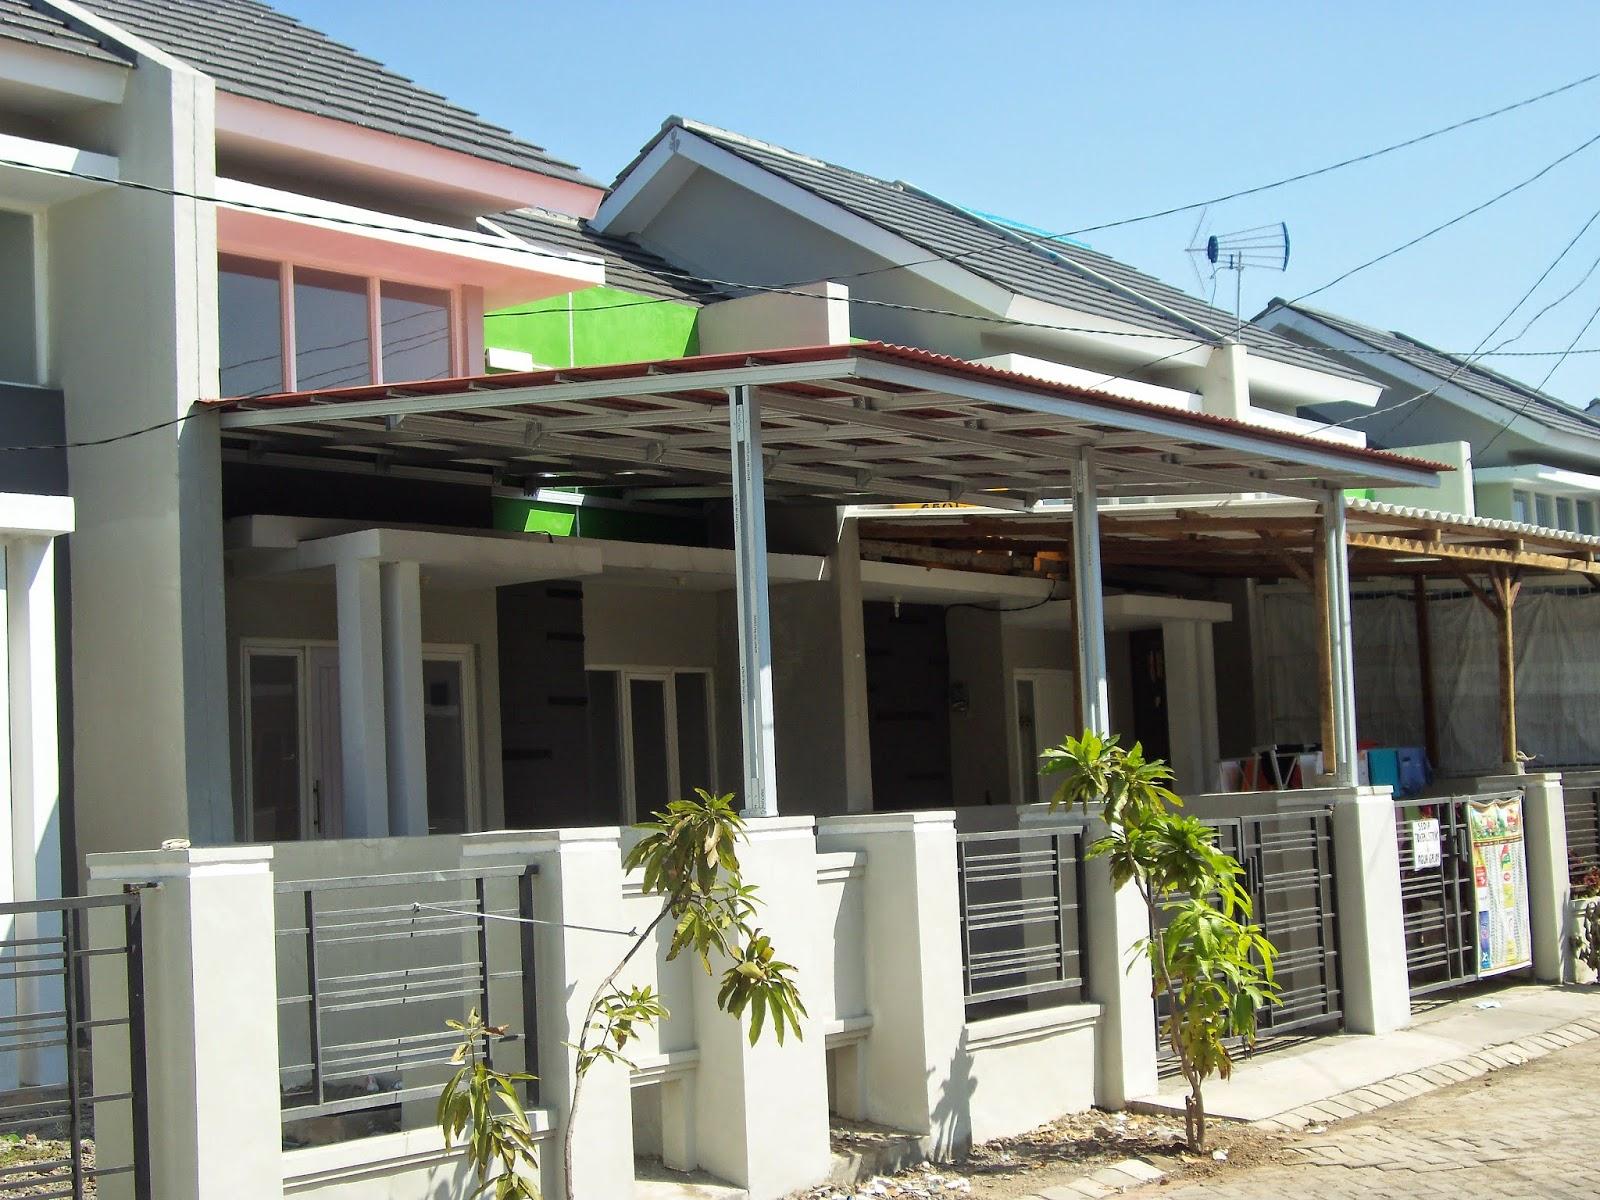 Kanopi Baja Ringan Untuk Rumah Minimalis Spesialis Bajaringan Surabaya